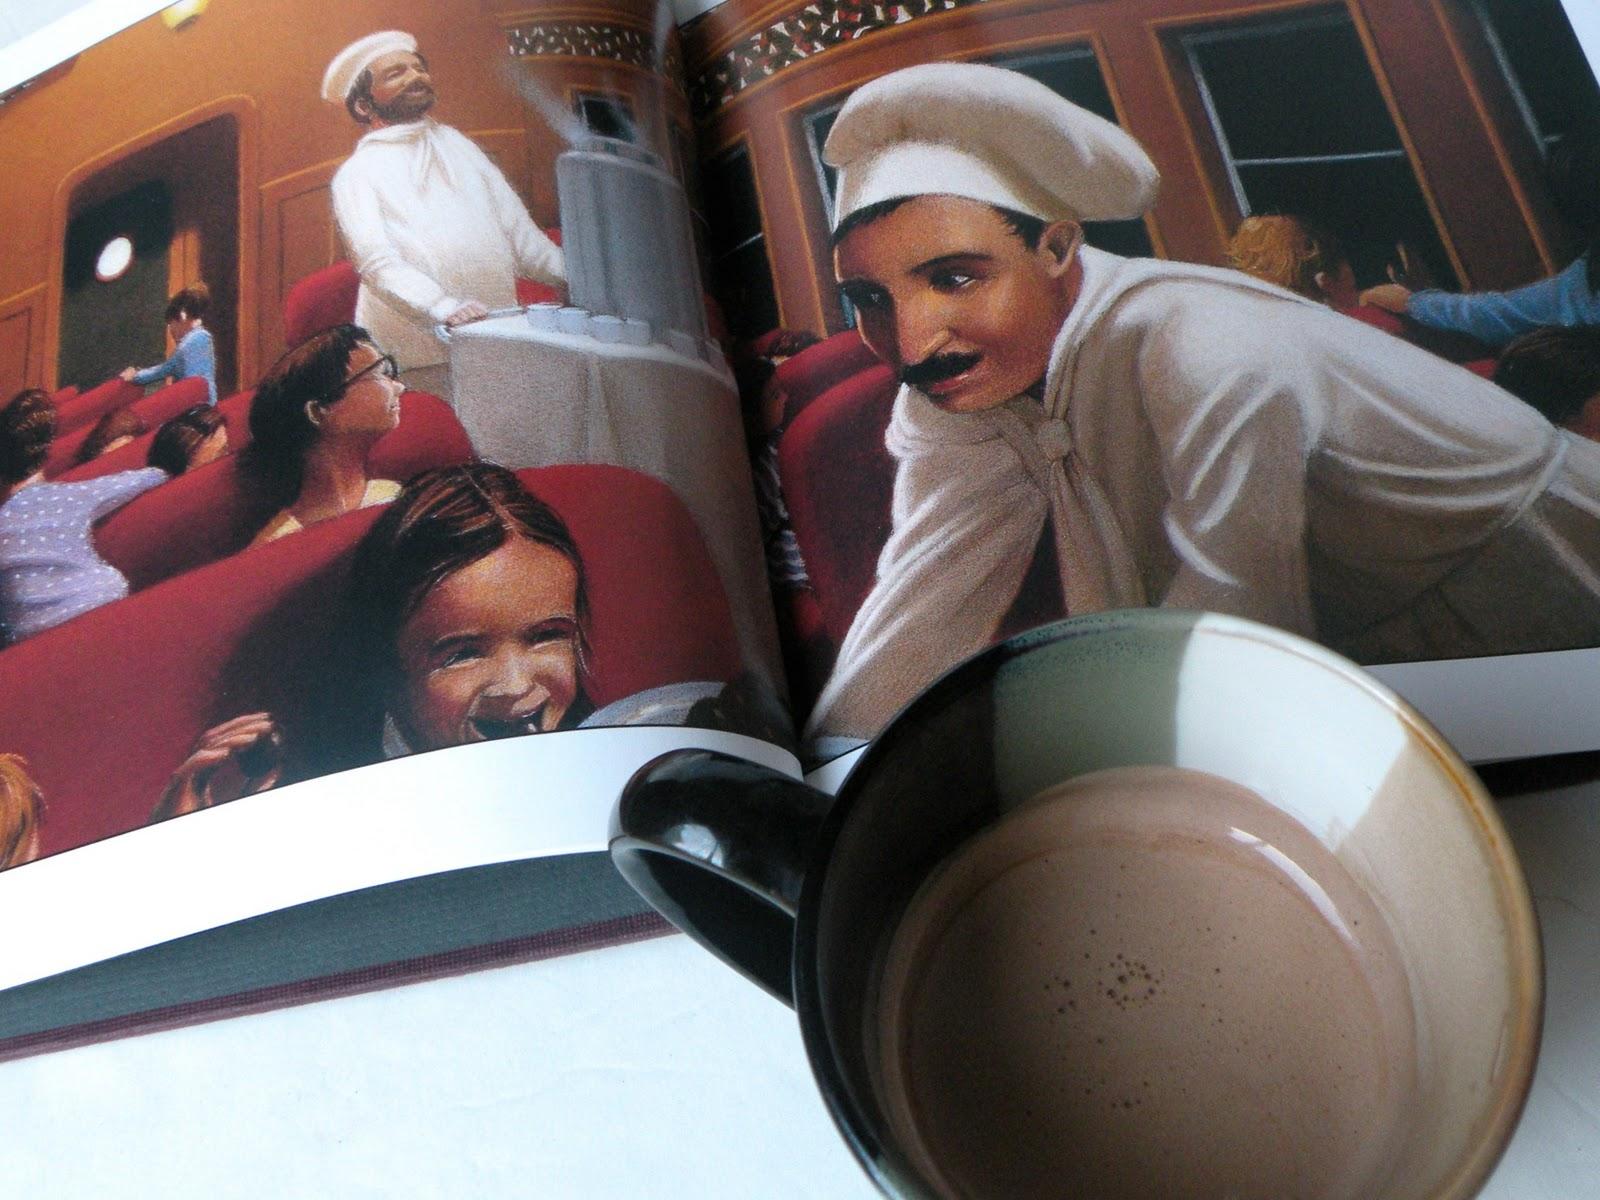 Toddler Approved!: Polar Express Hot Cocoa